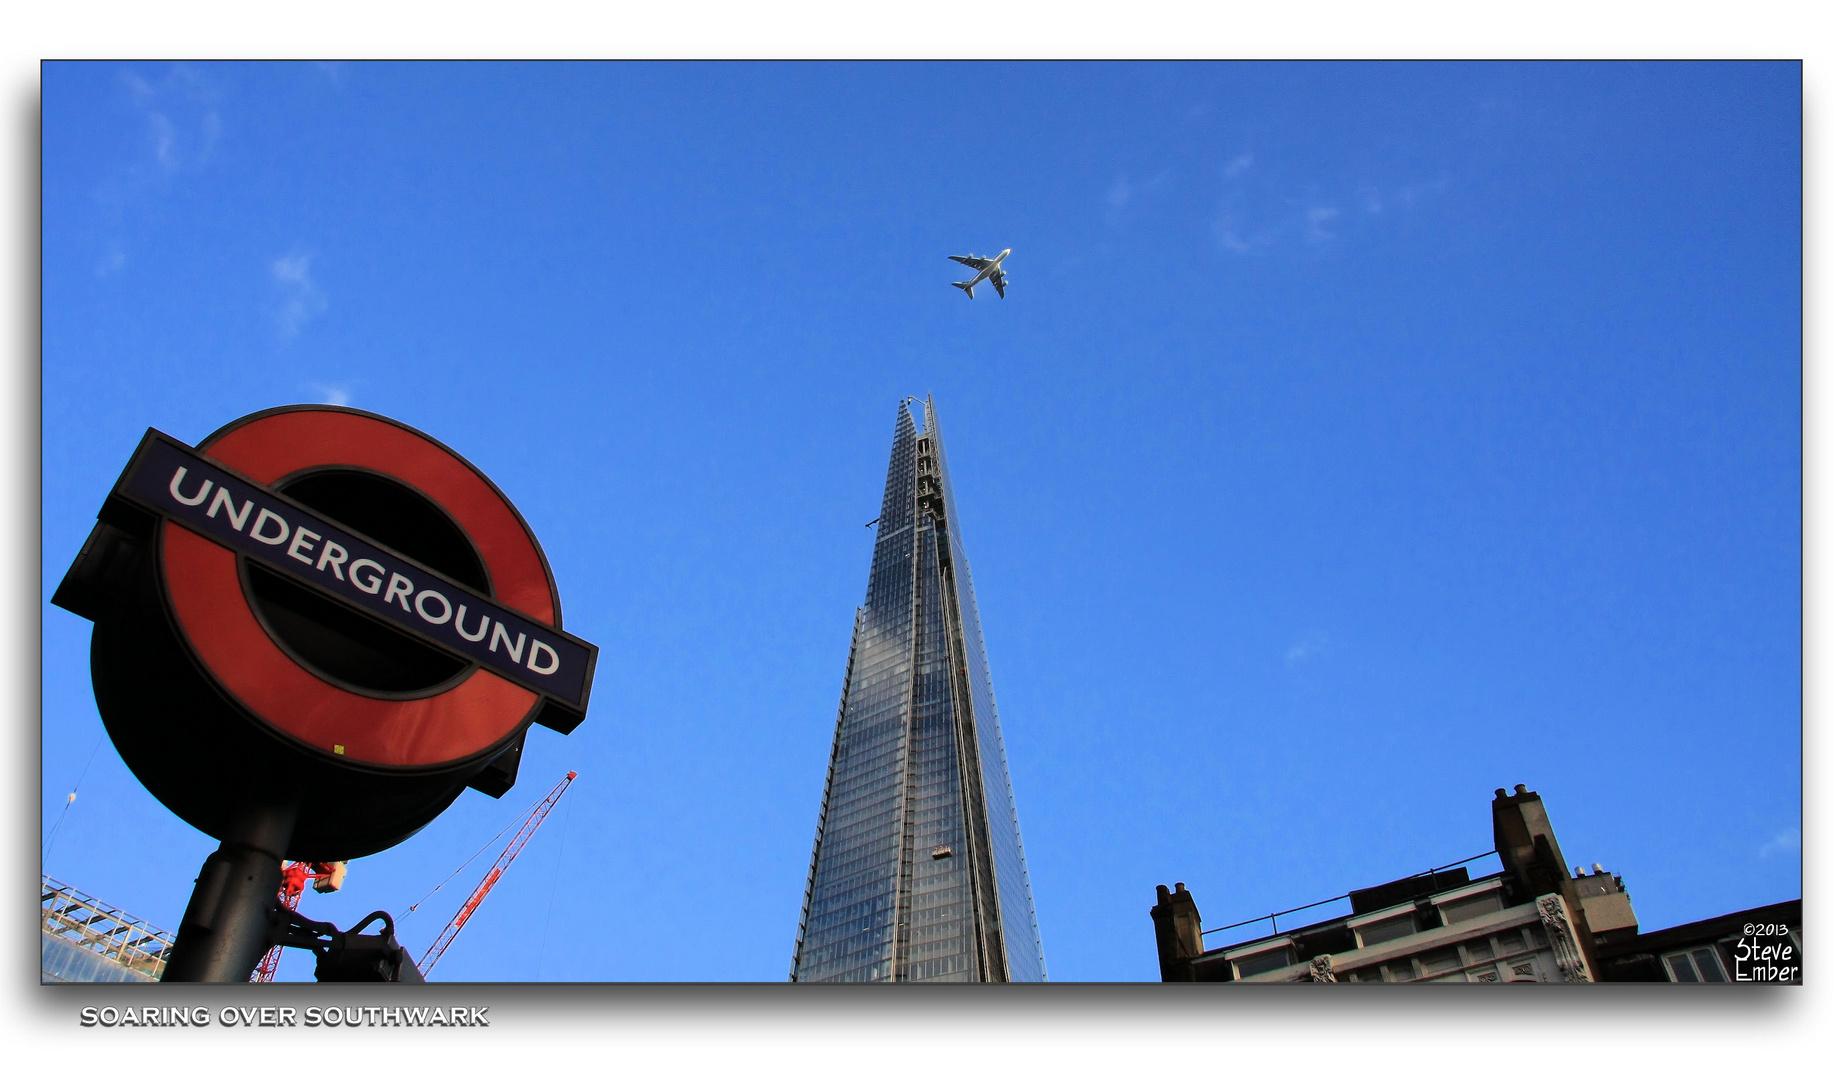 Soaring over Southwark